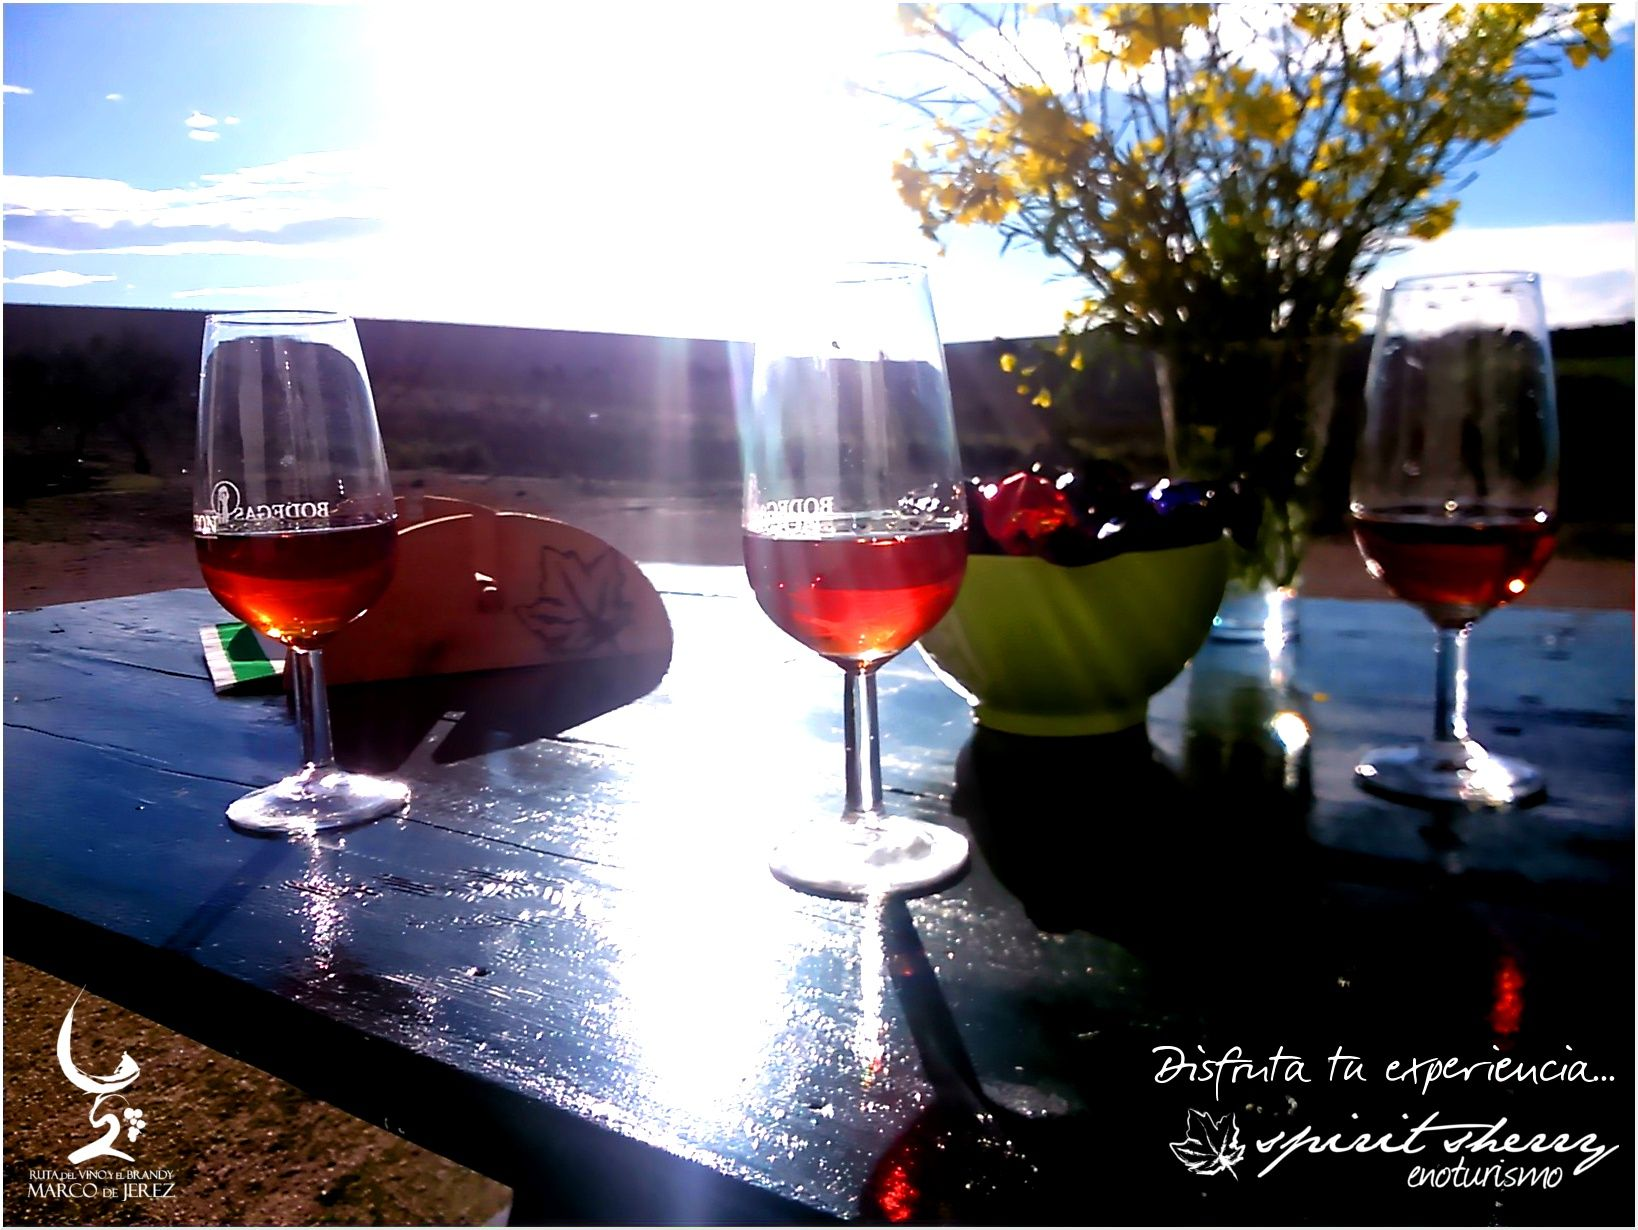 Enjoy the experience... Vineyard+ Sherry-Wine+ Sun = Spirit Sherry, wine tour... Jerez de la Frontera, Cádiz, Andalucía, Spain